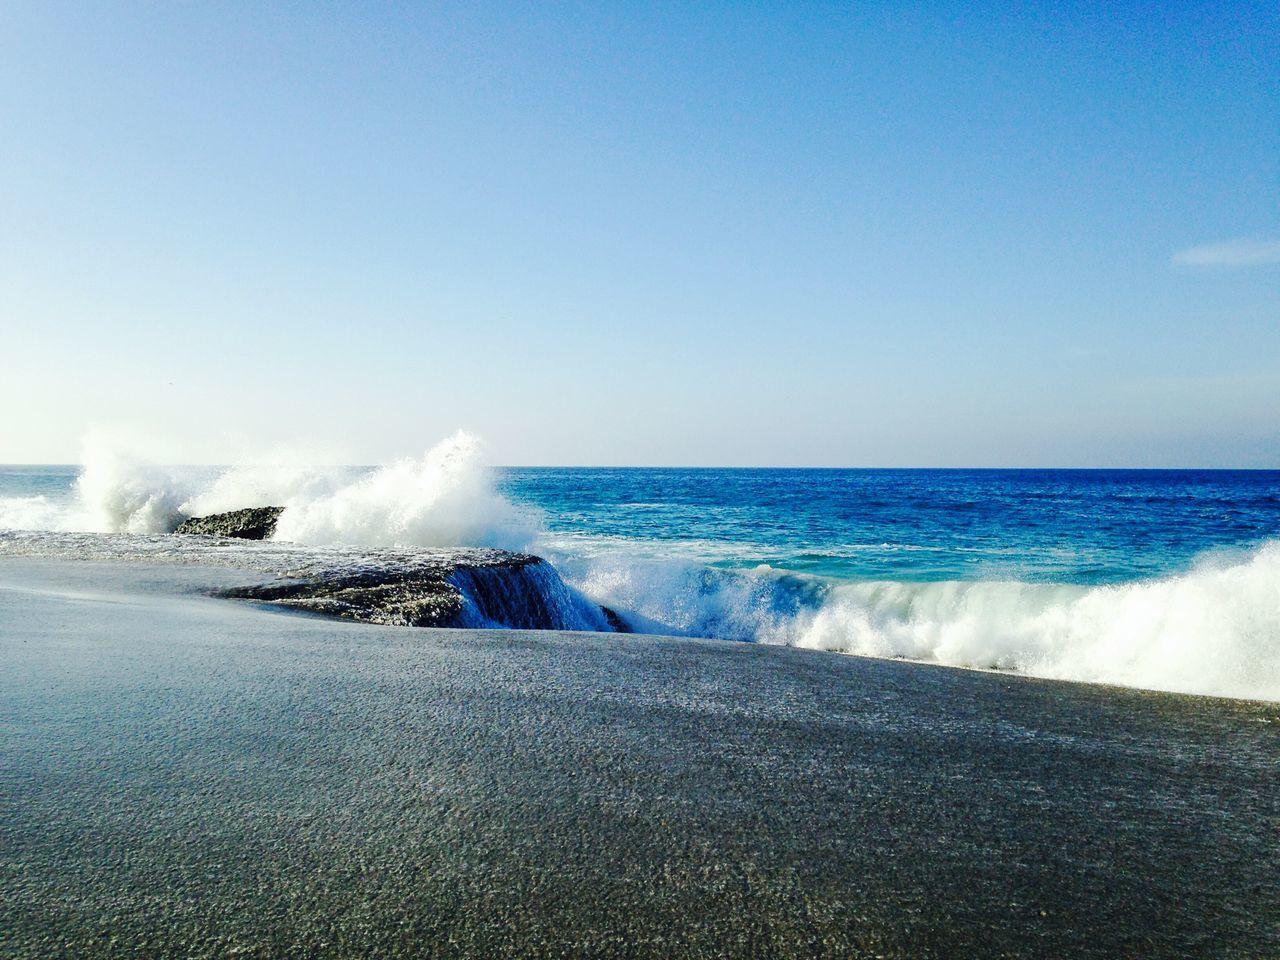 Sea Waves Splashing On Shore Against Clear Sky